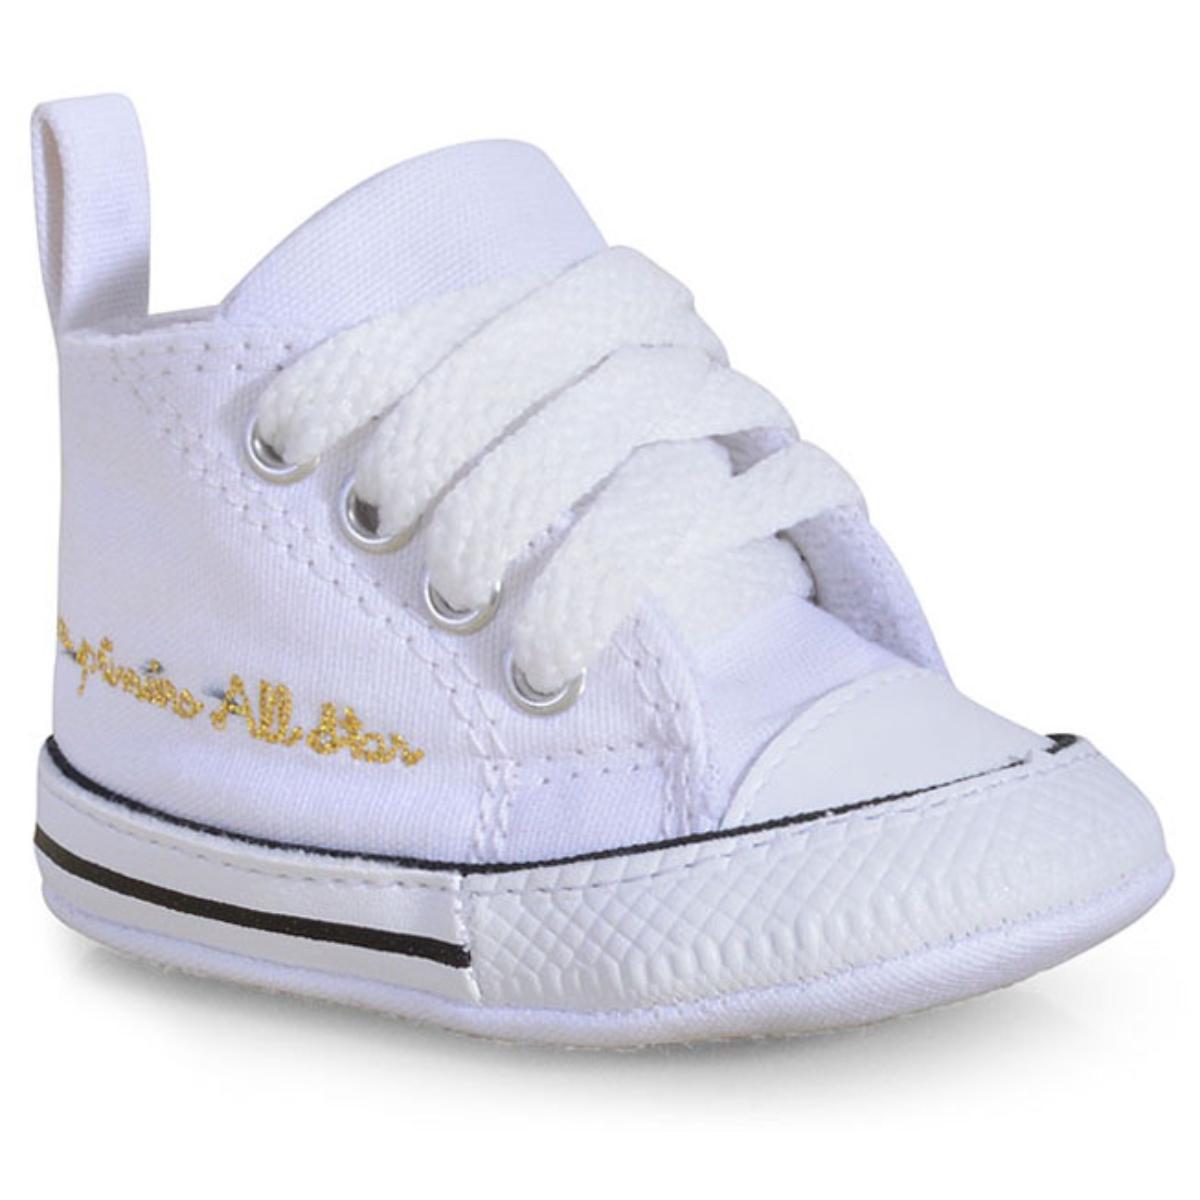 Tênis Uni Infantil All Star Ck04400003 Branco/preto